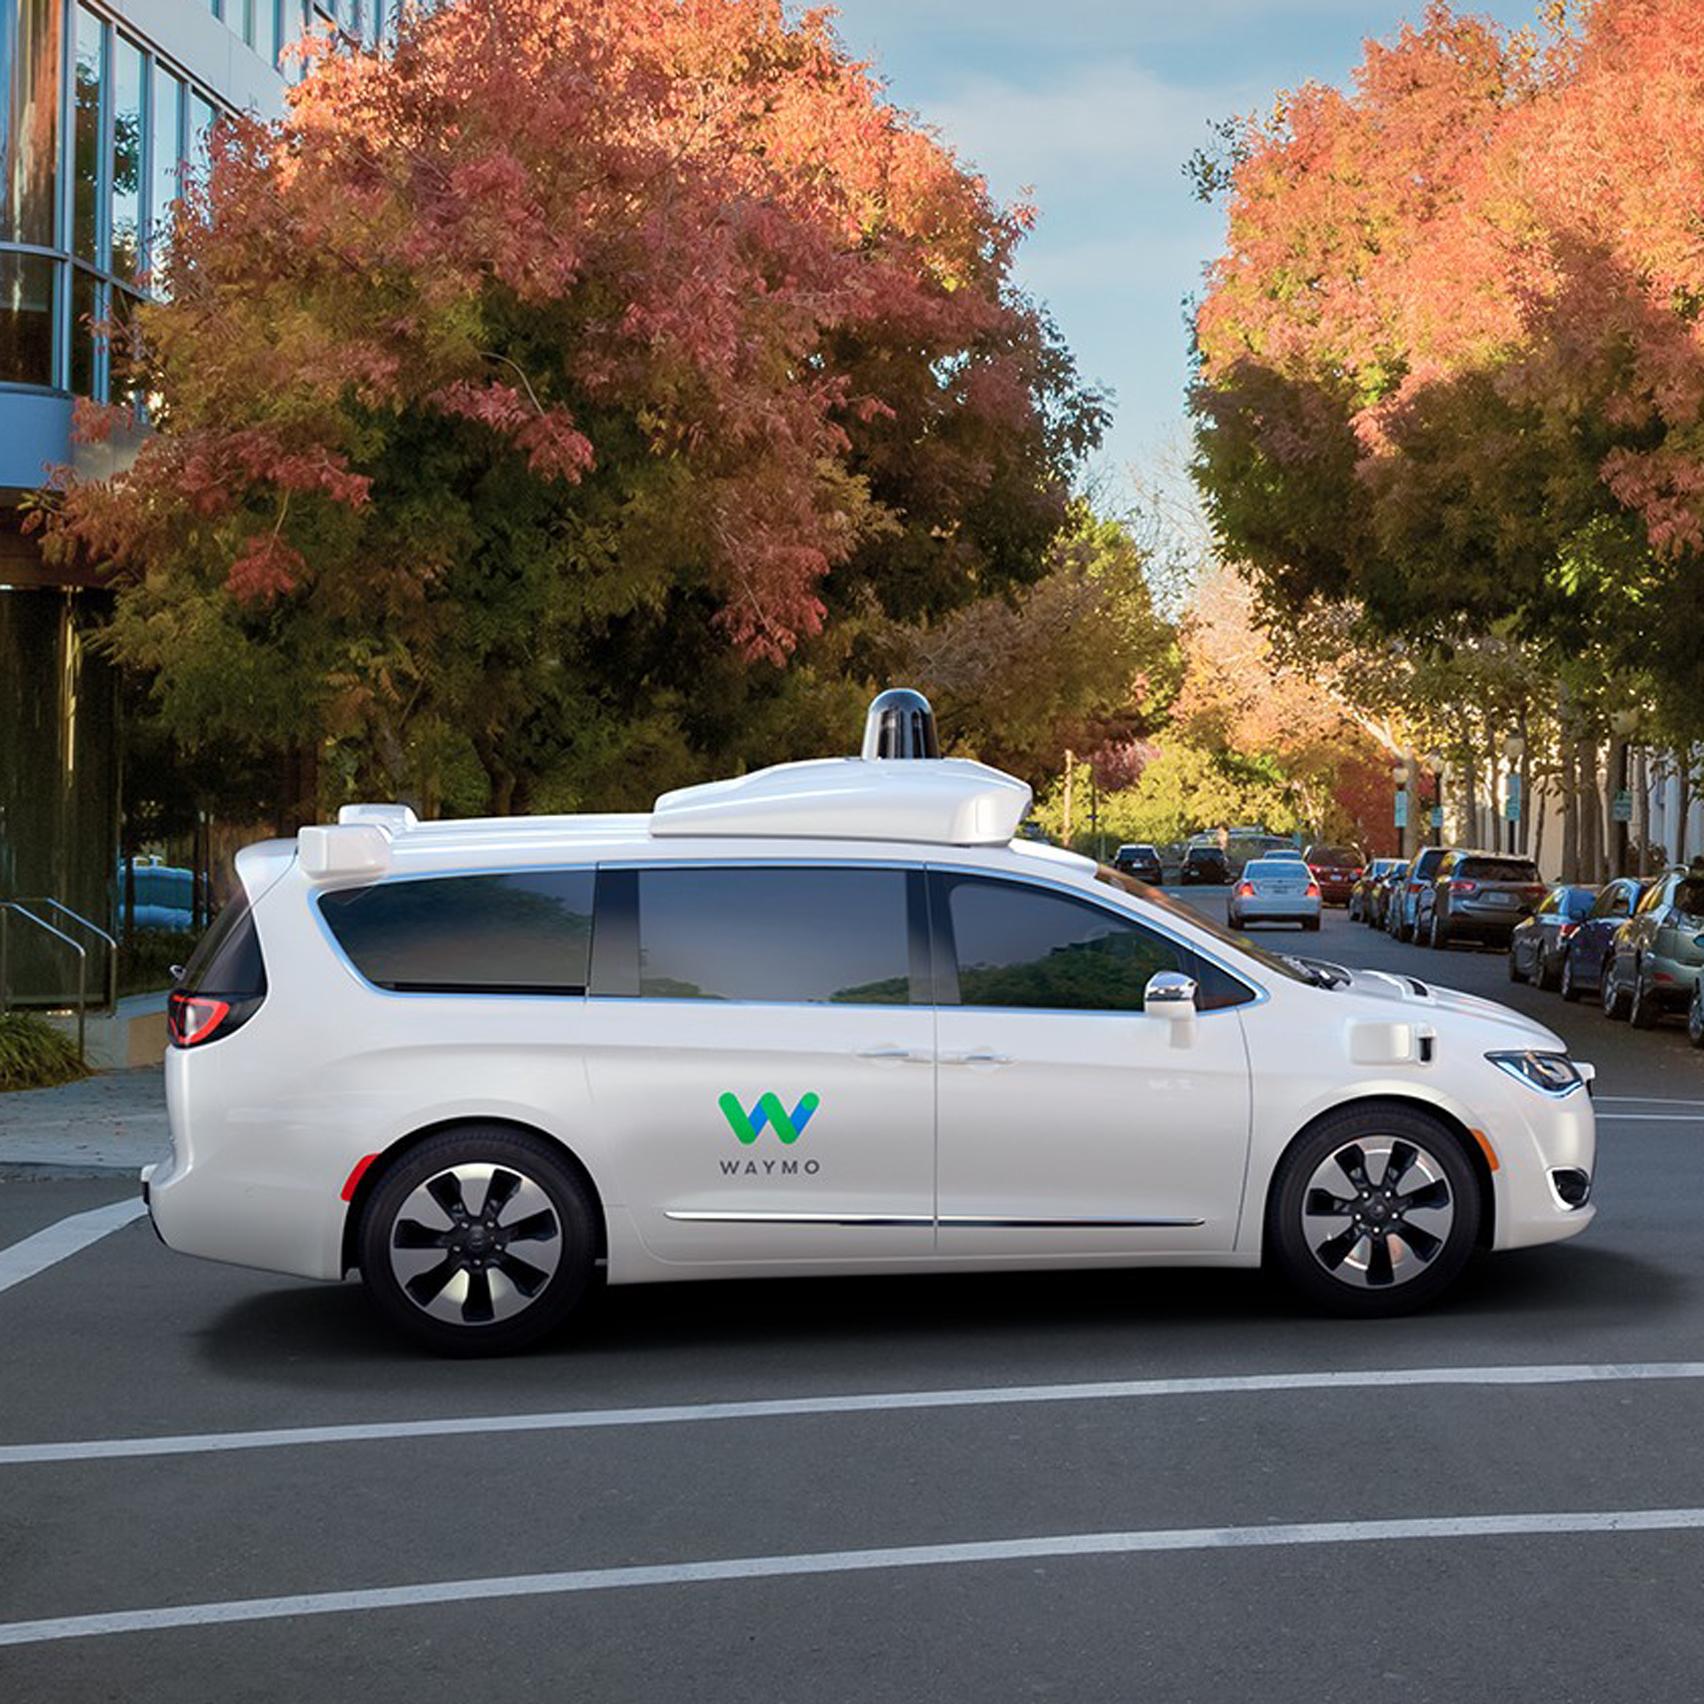 Waymo Chrysler self-driving car